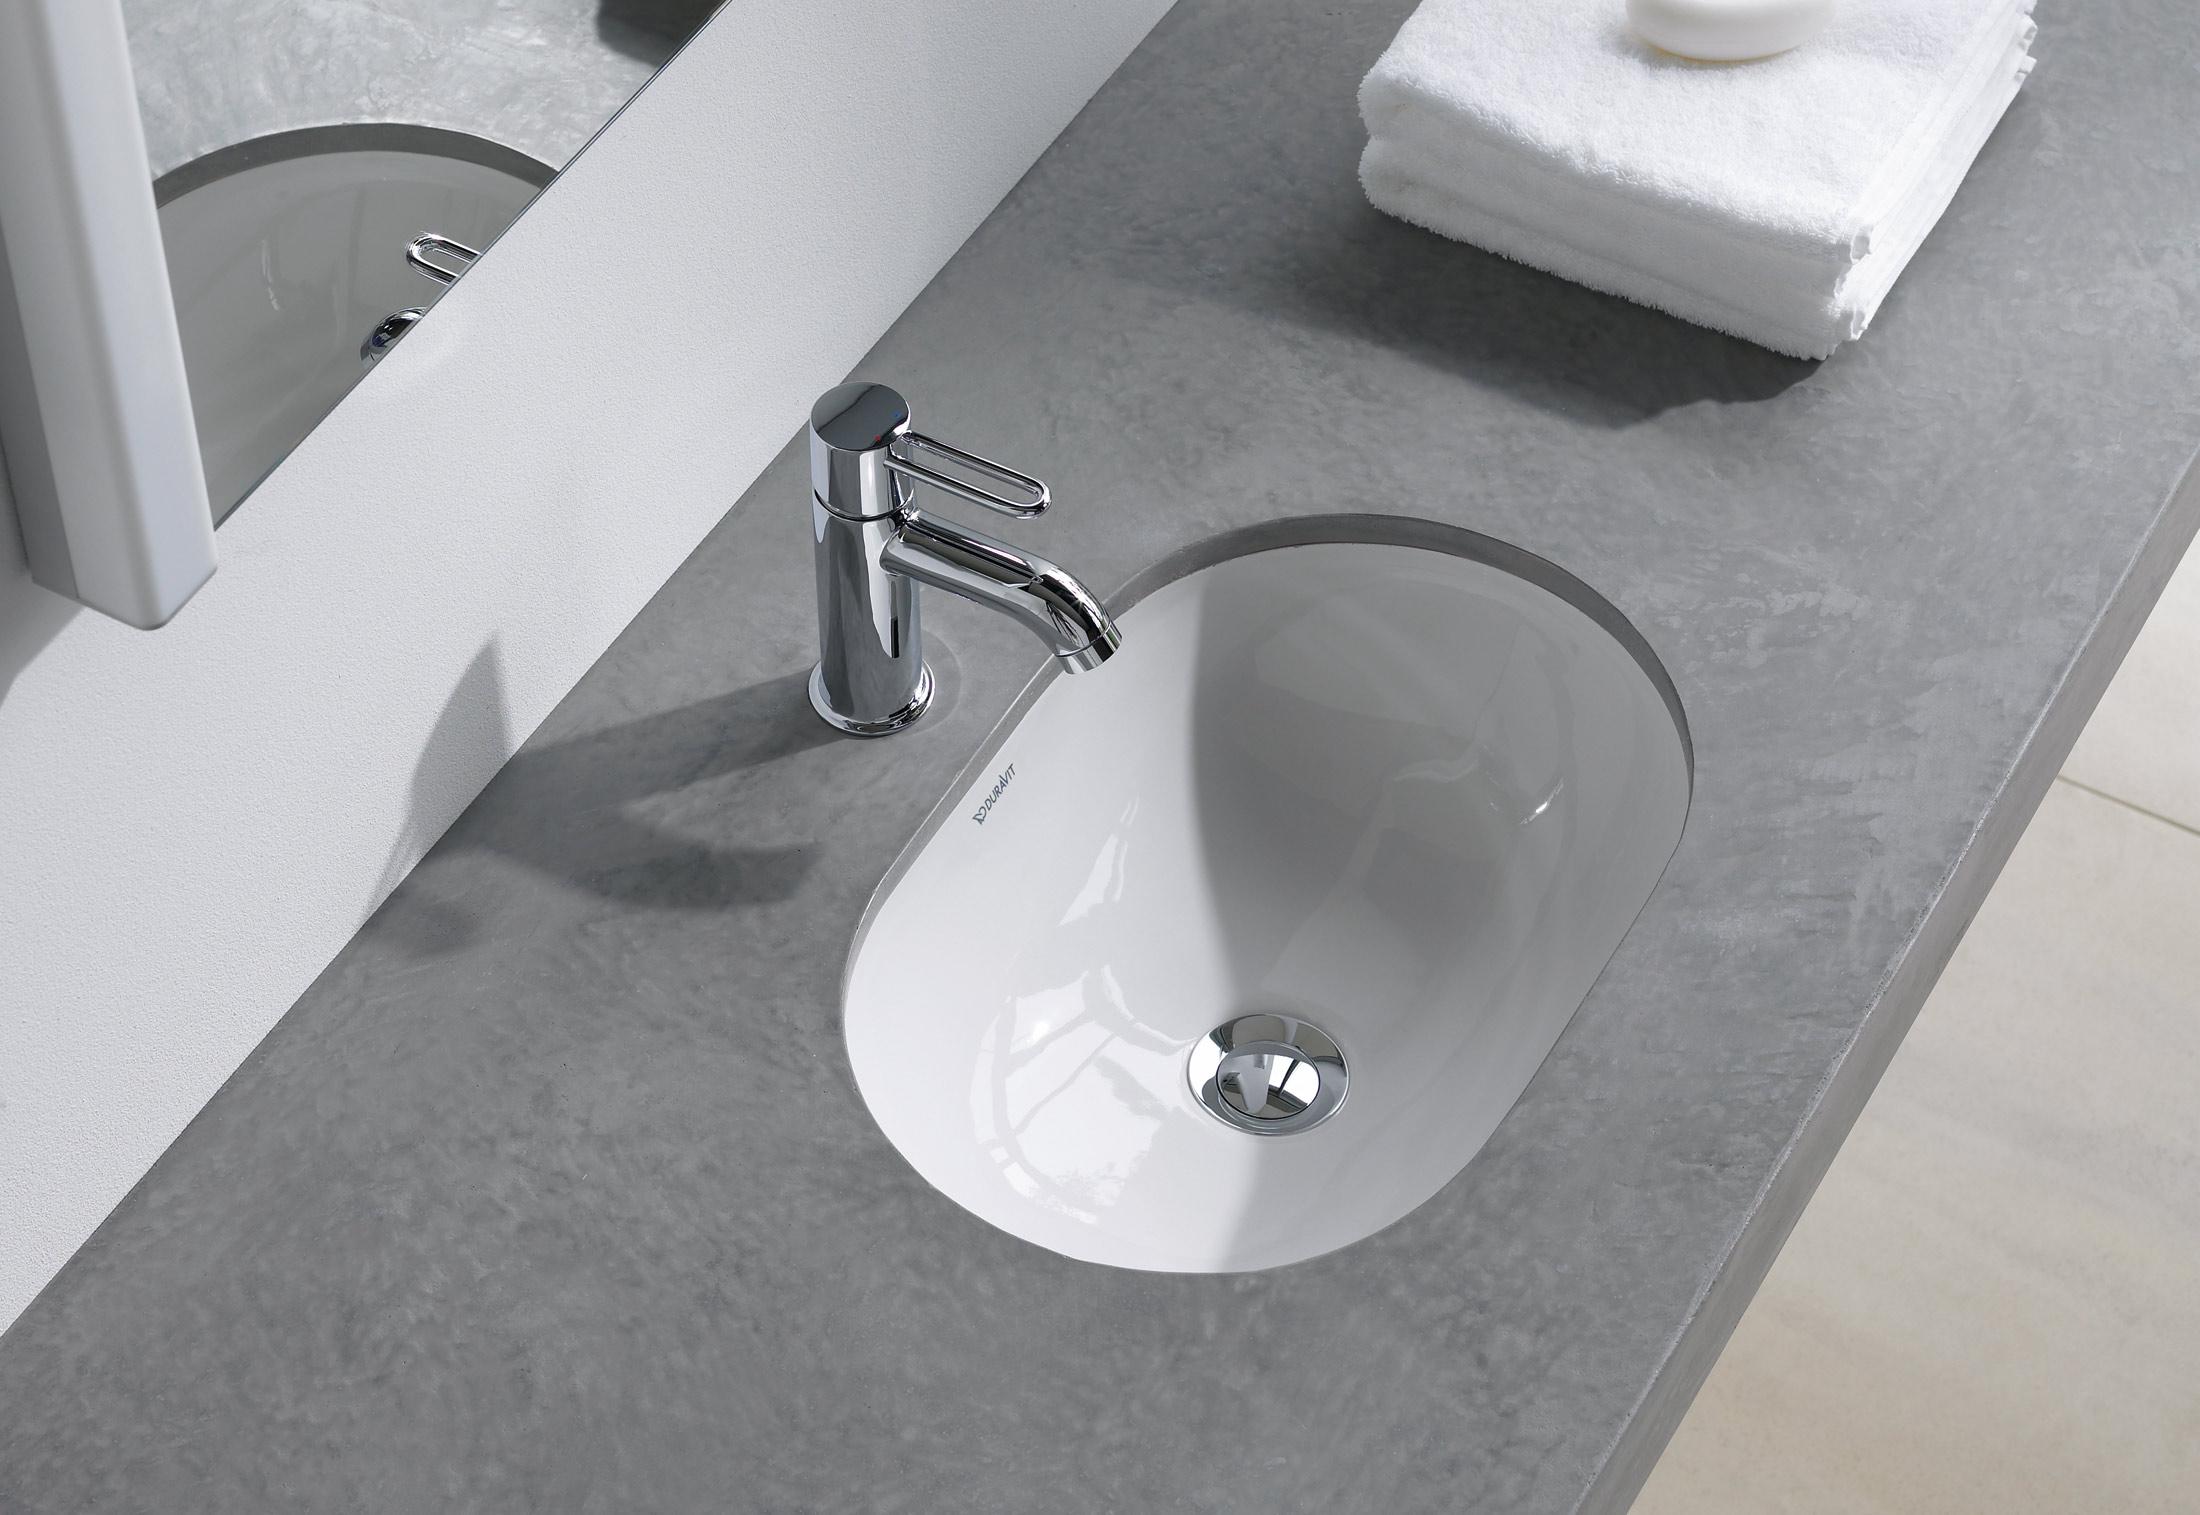 foster vanity basin foster vanity basin - Duravit Sink